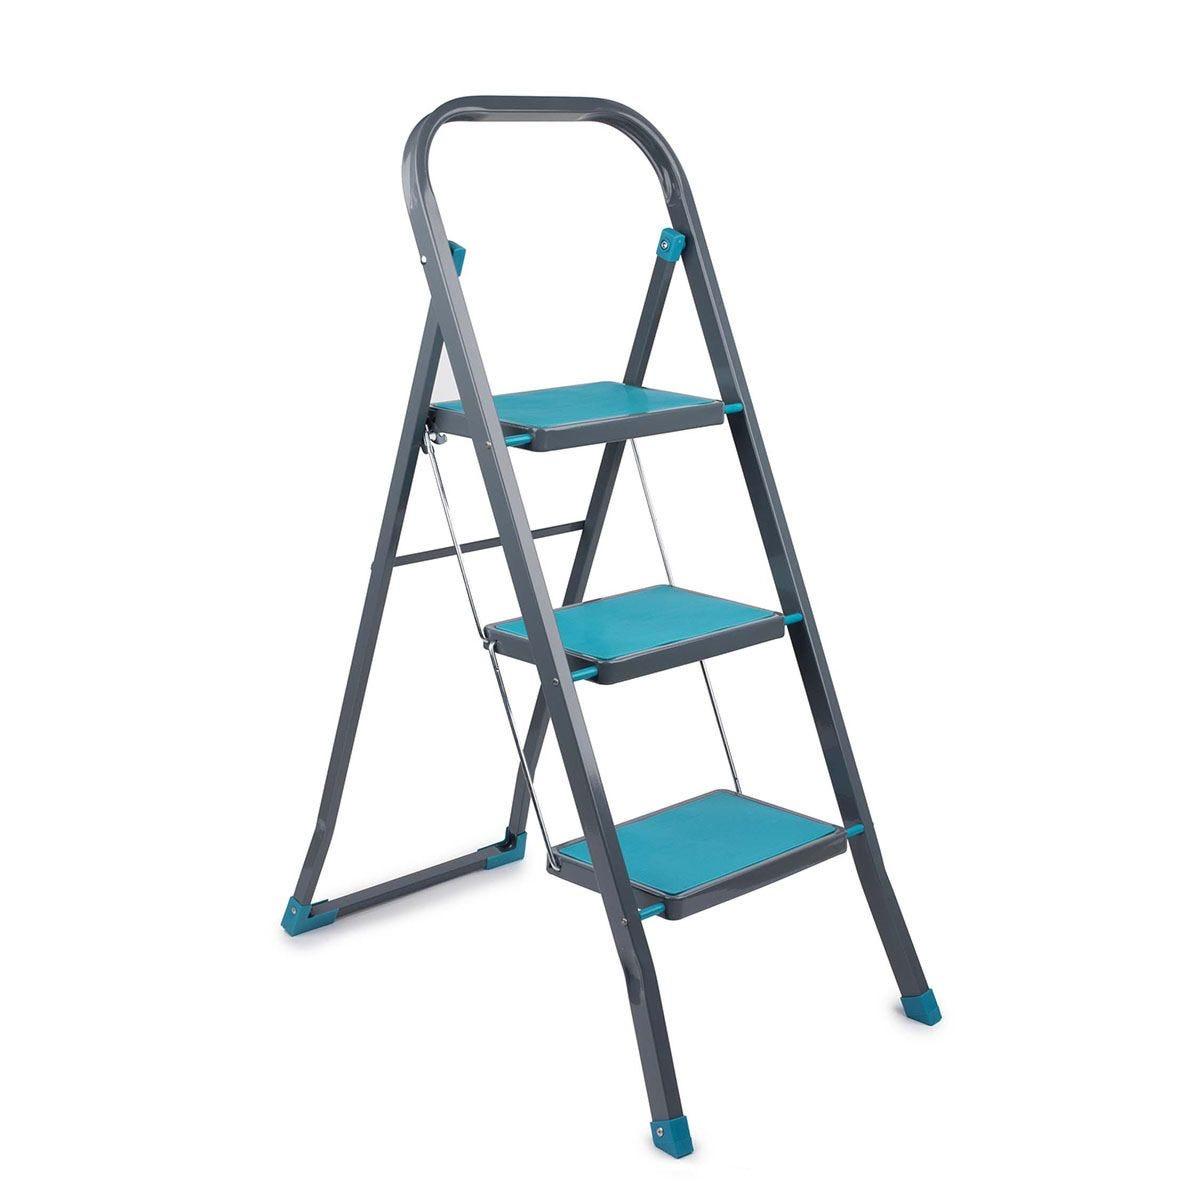 Beldray 3 Step DIY Hobby Stepladder - Turquoise